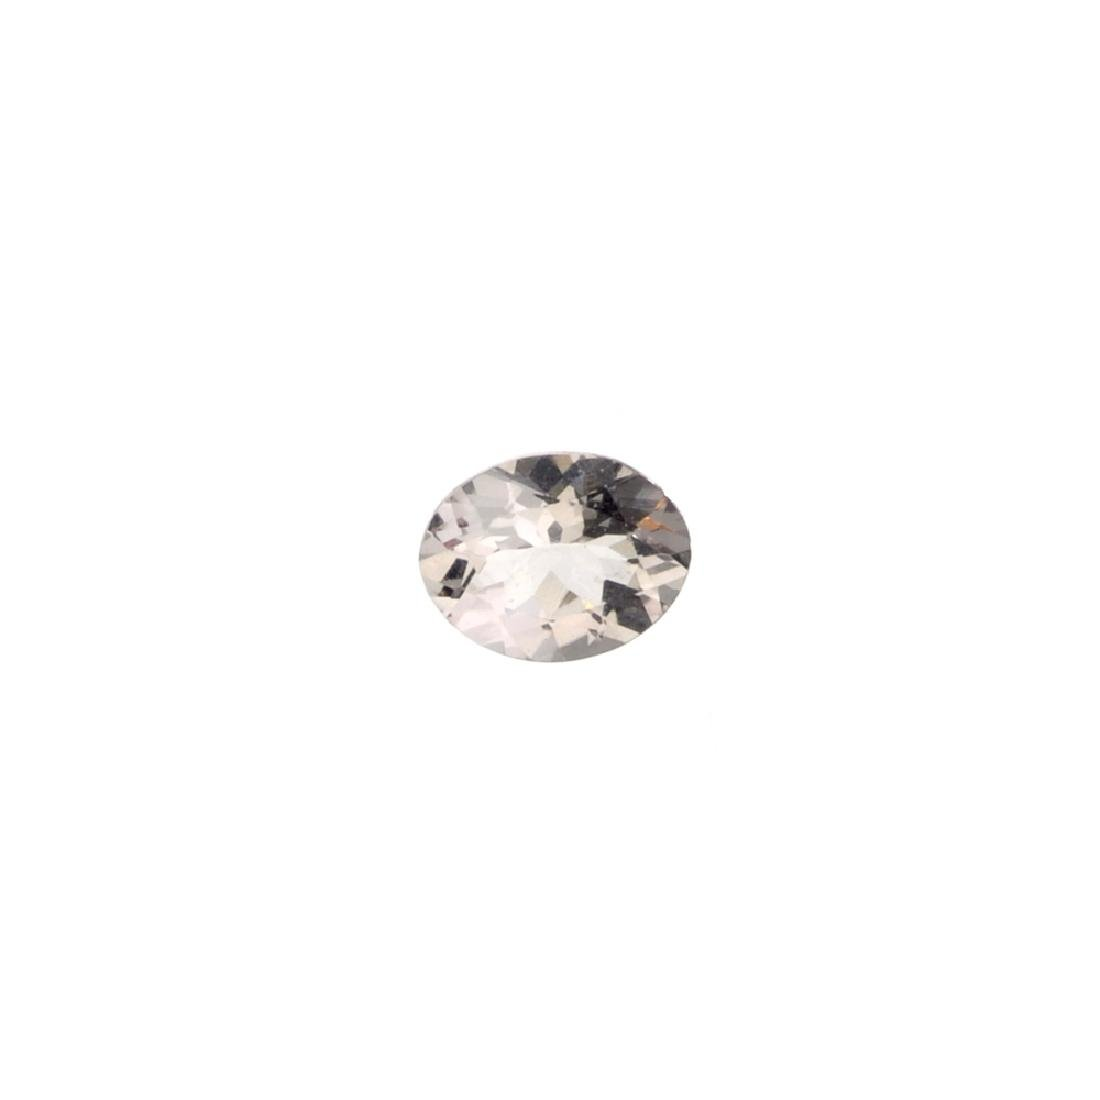 APP: 1.2k 1.73CT Oval Cut Morganite Gemstone